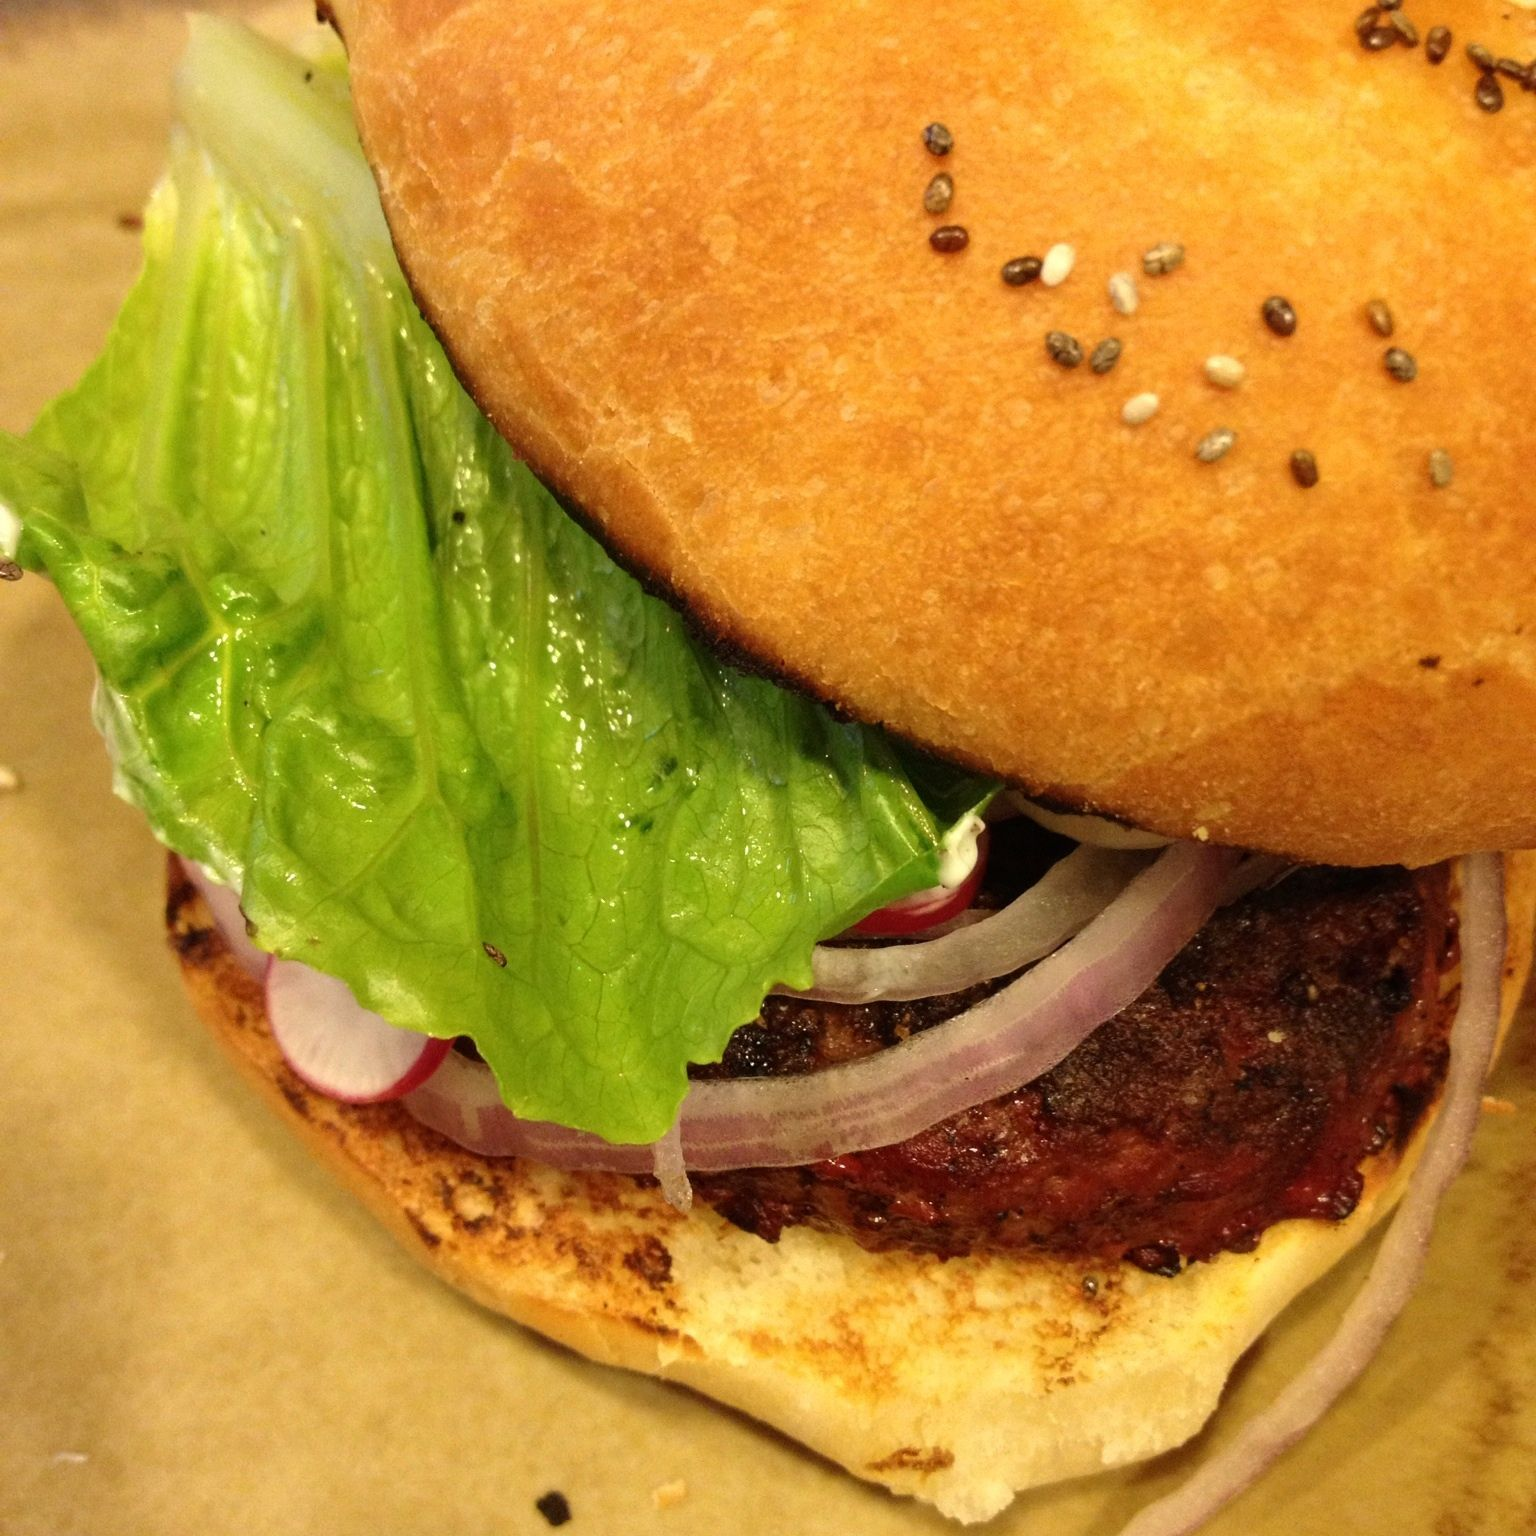 Yak burgers (don't talk back) on freshly baked buns.